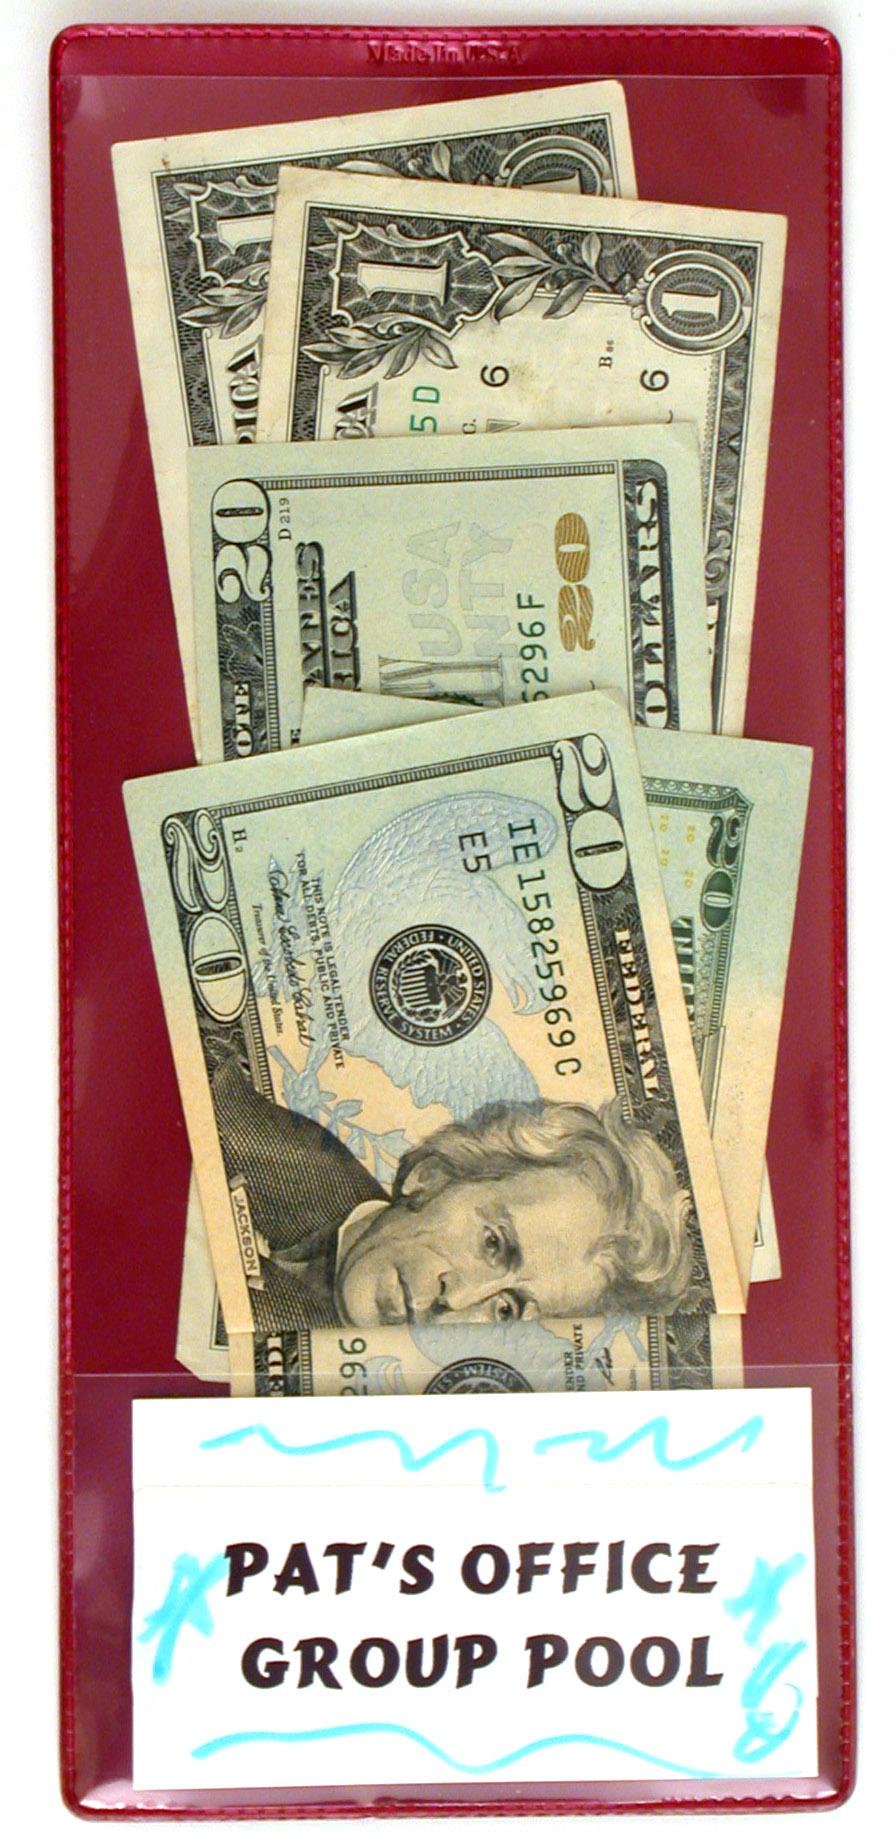 Lottery Ticket Holders Press Room Storesmart Filing